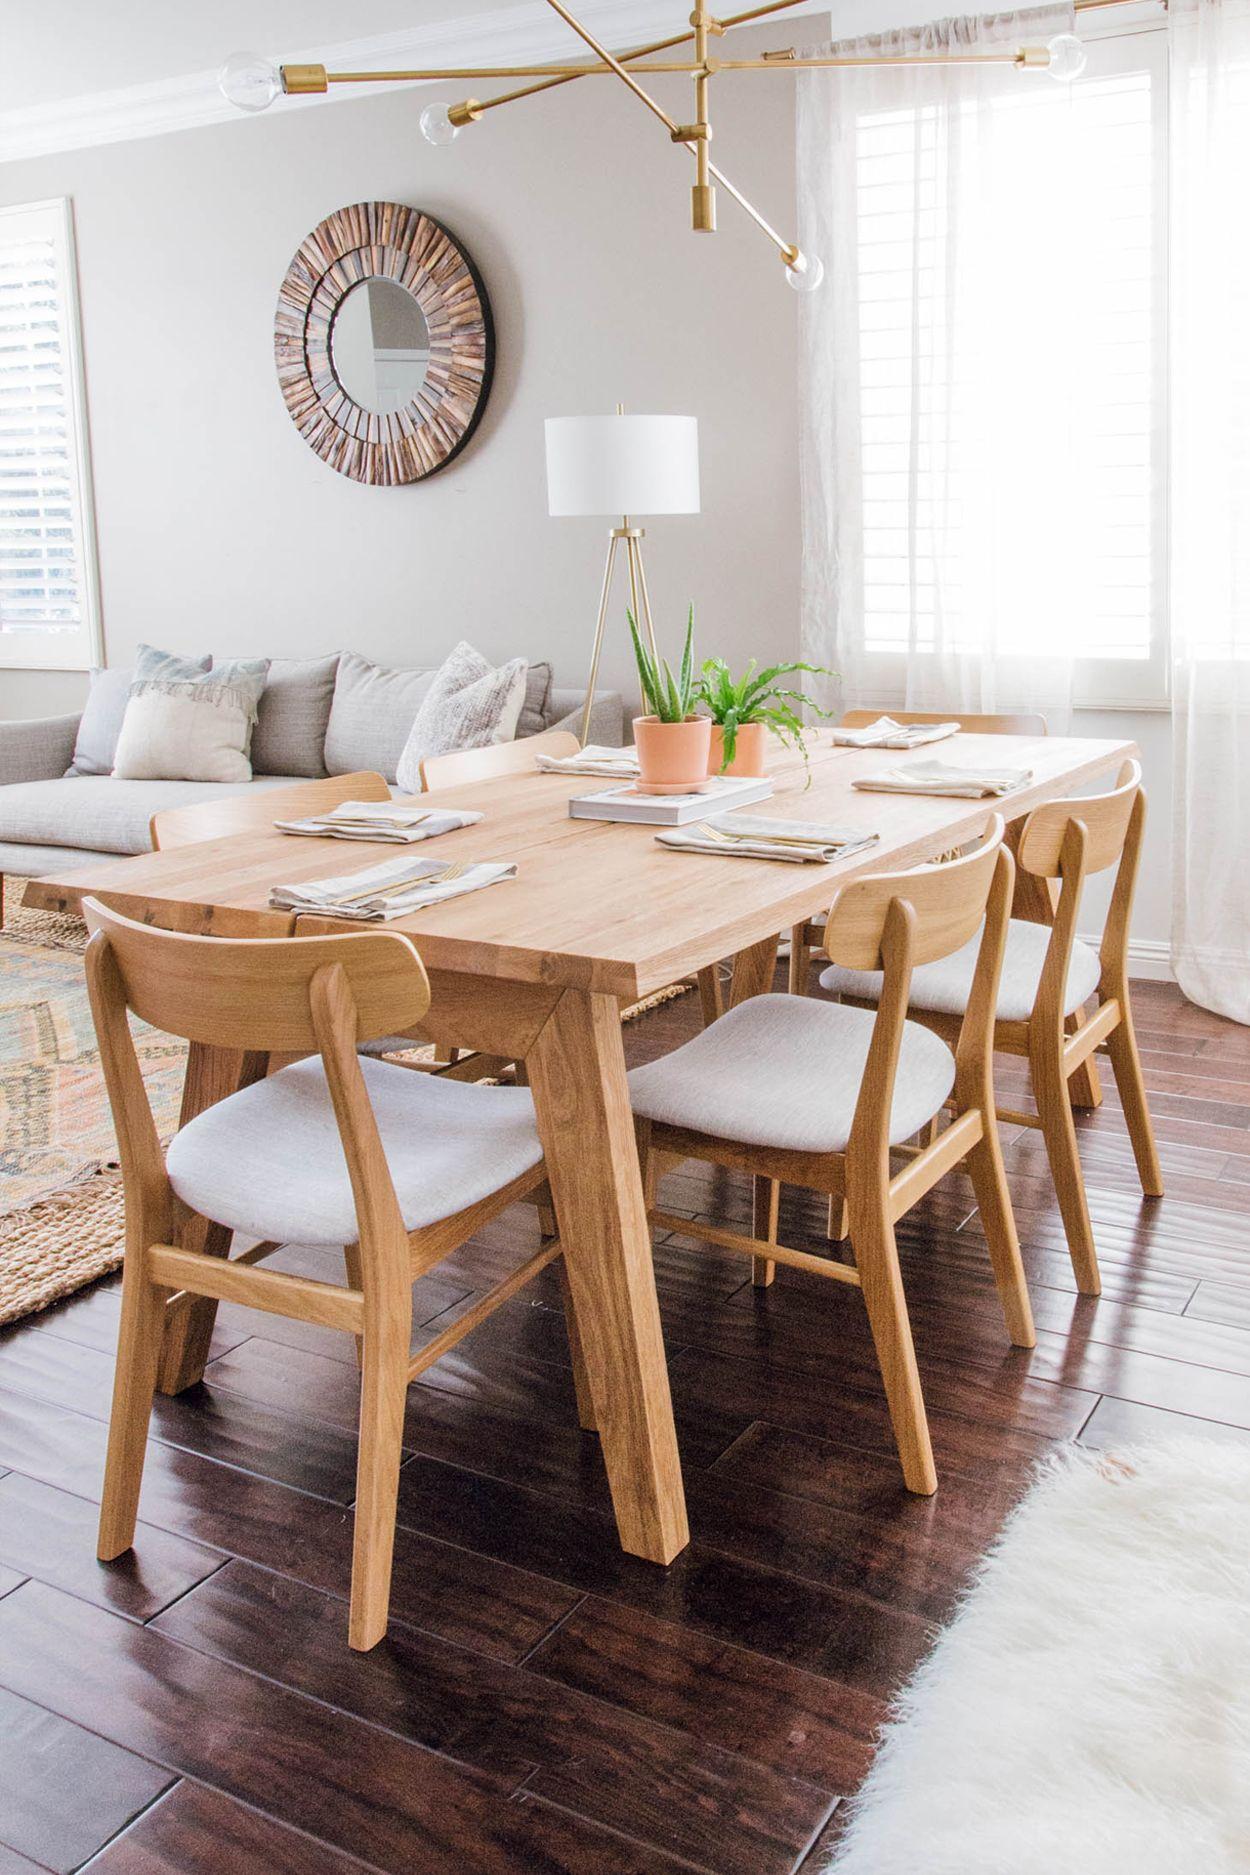 Choosing this beautiful light colored minimalist style